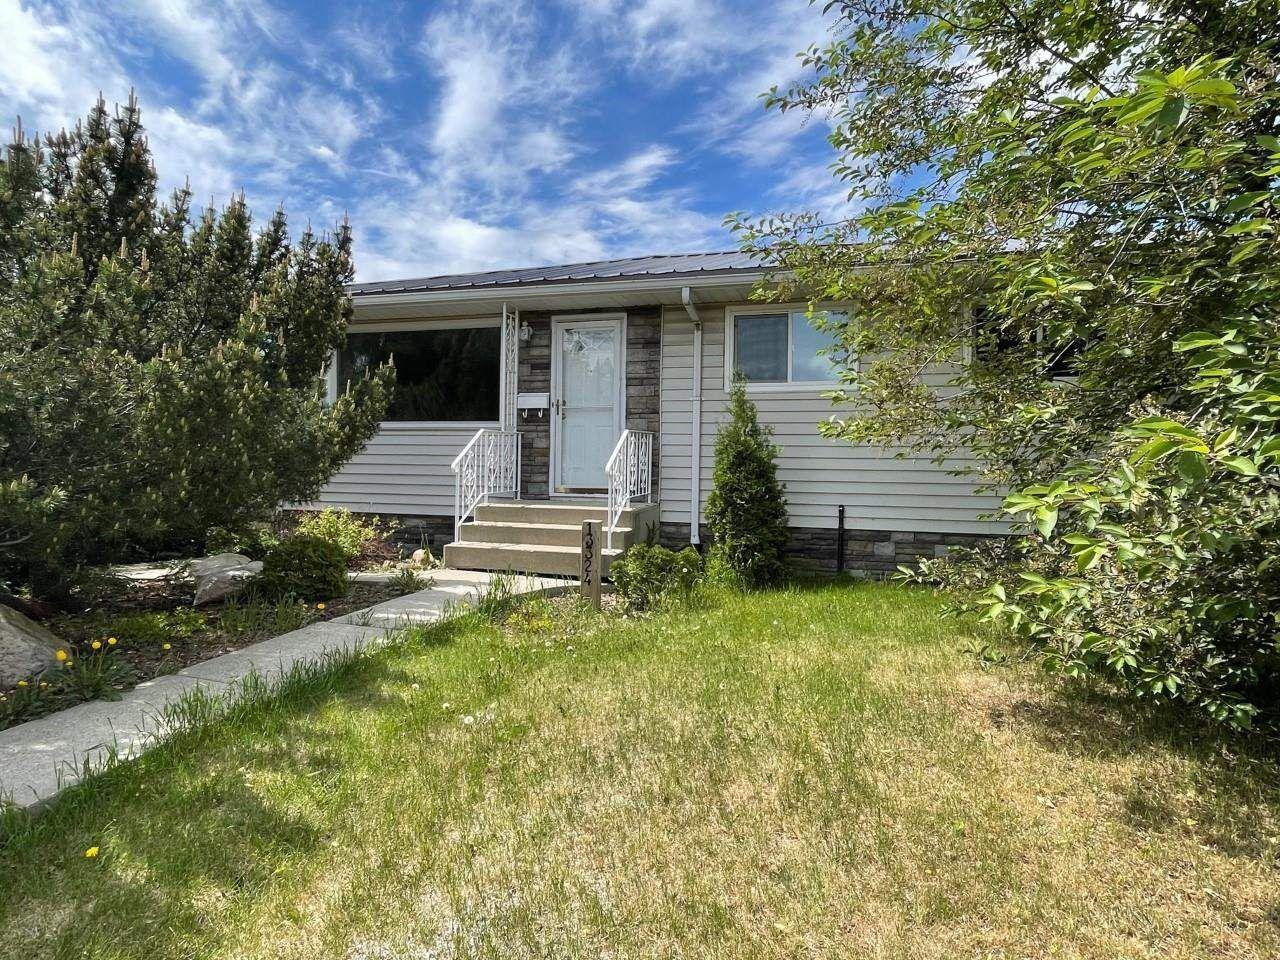 Main Photo: 13324 58 Street in Edmonton: Zone 02 House for sale : MLS®# E4248364